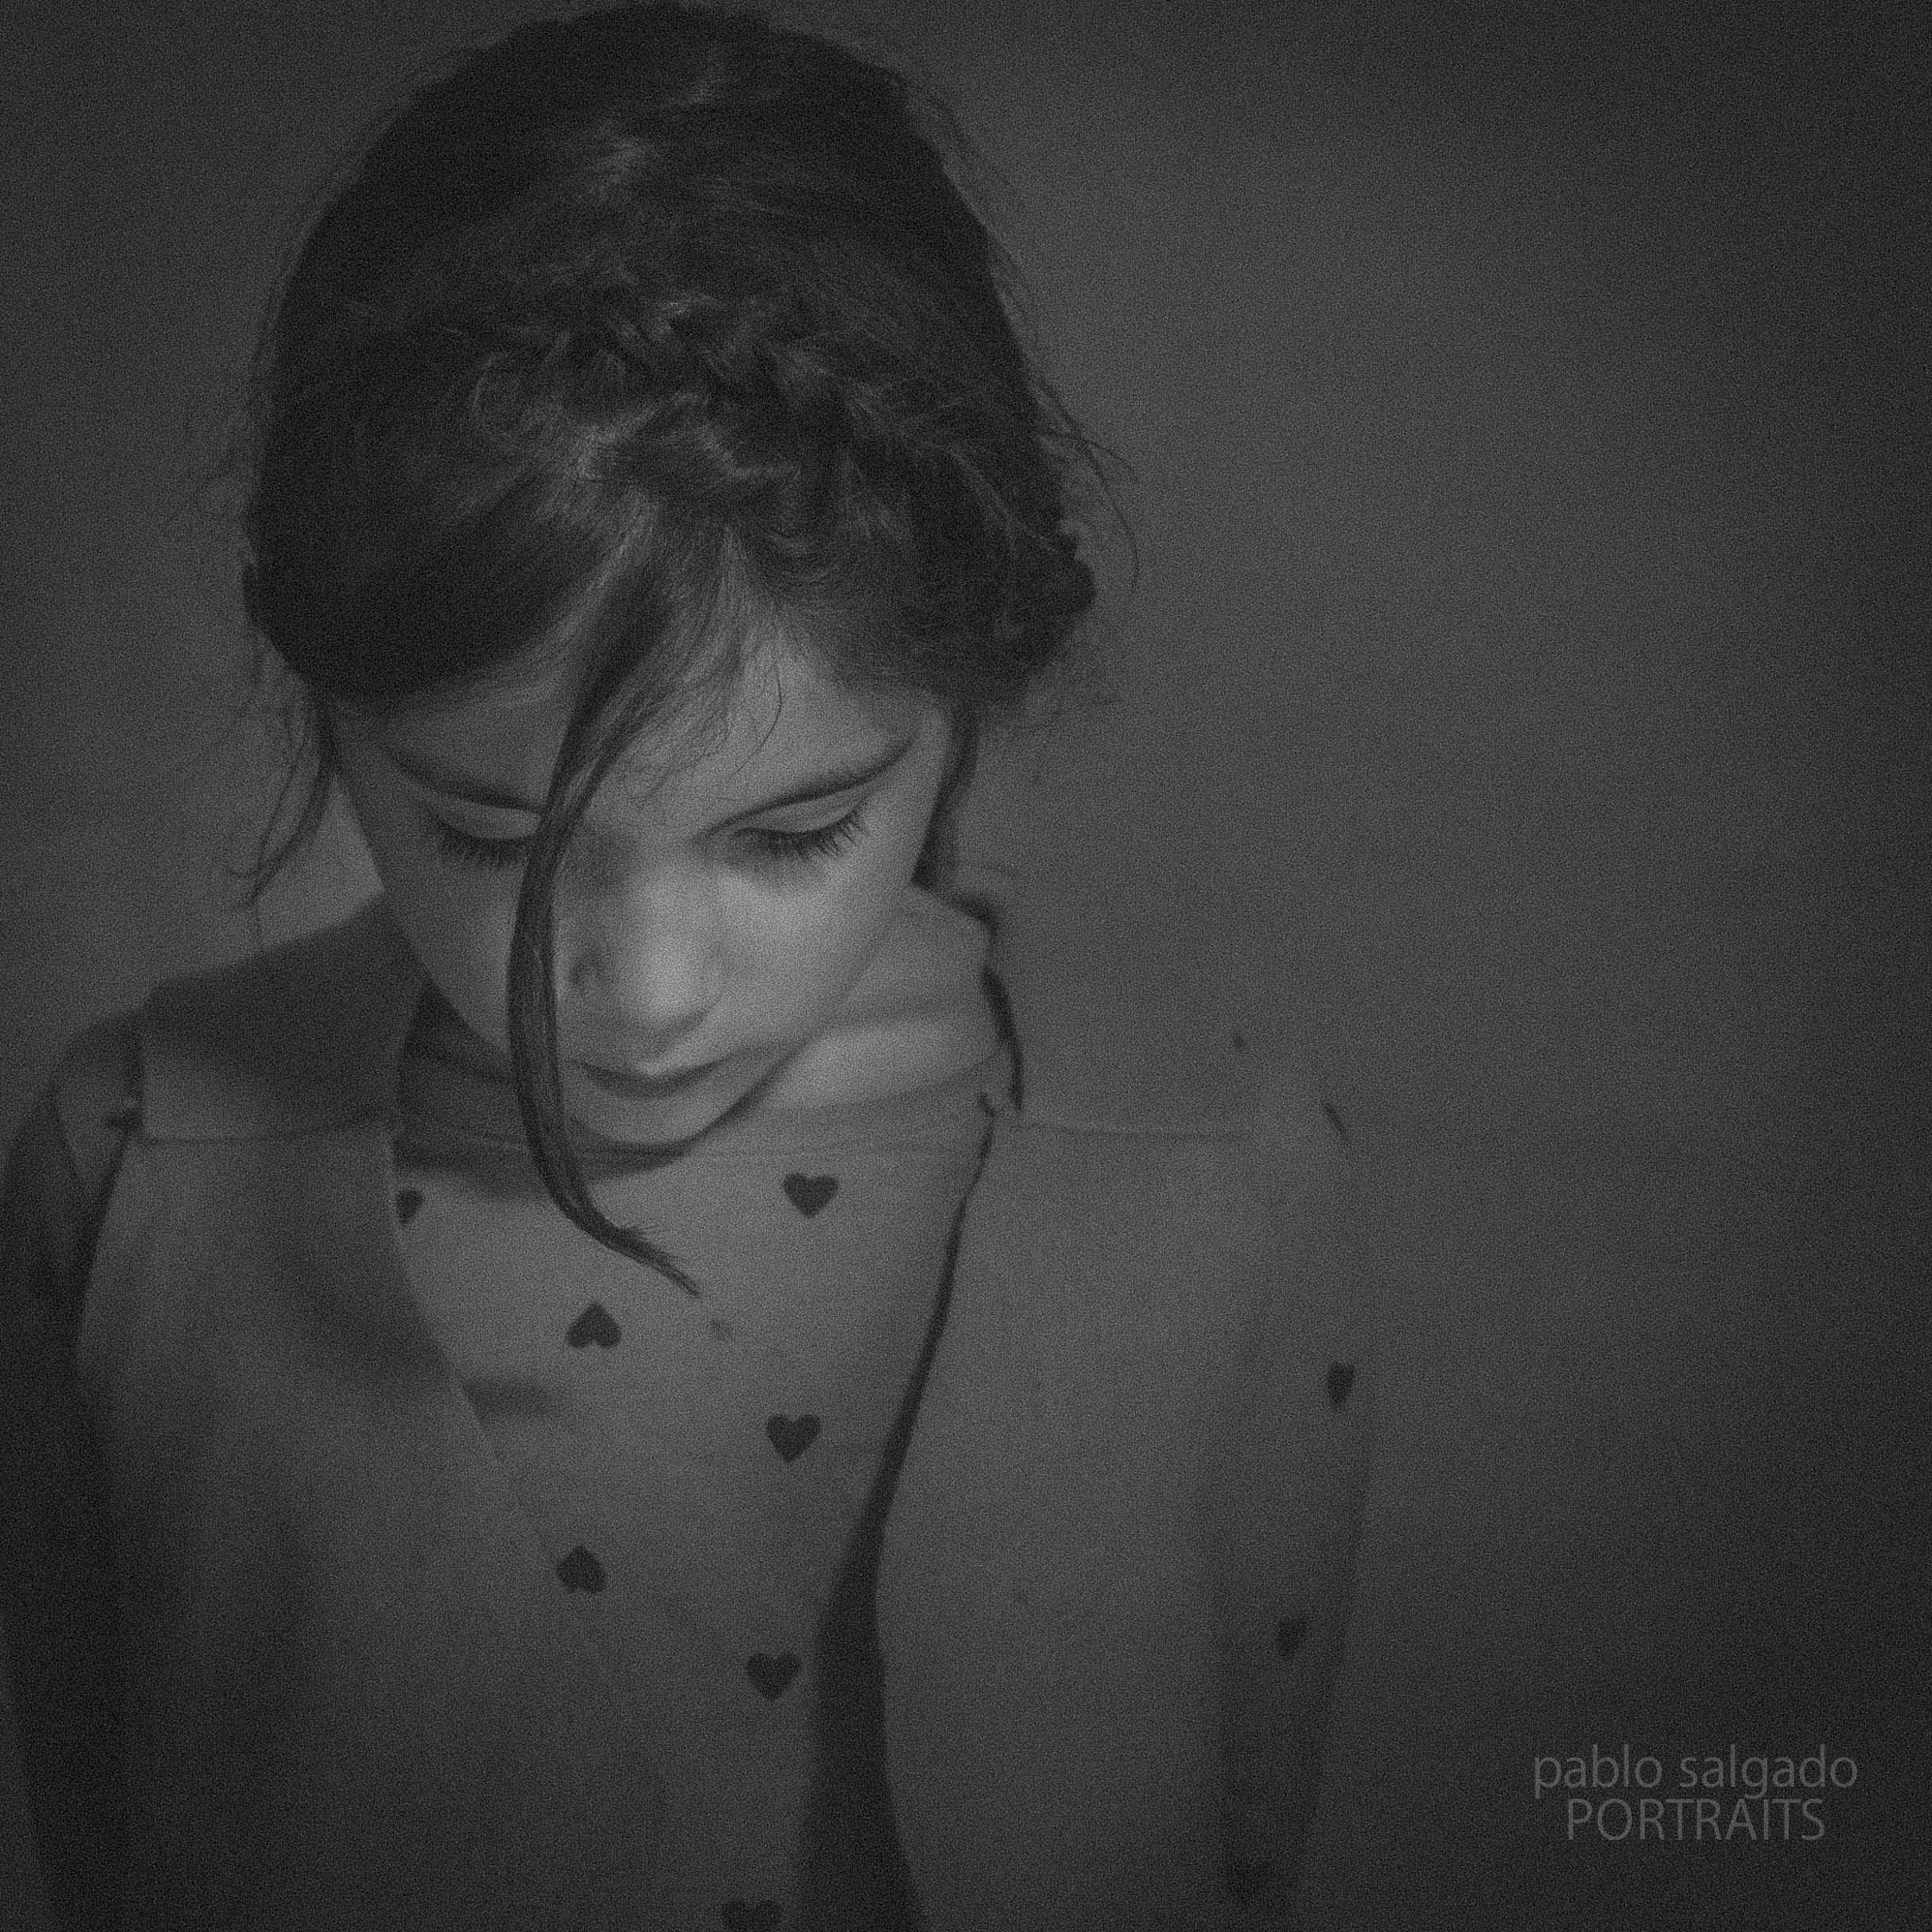 Mariana_Pablo Salgado Portraits